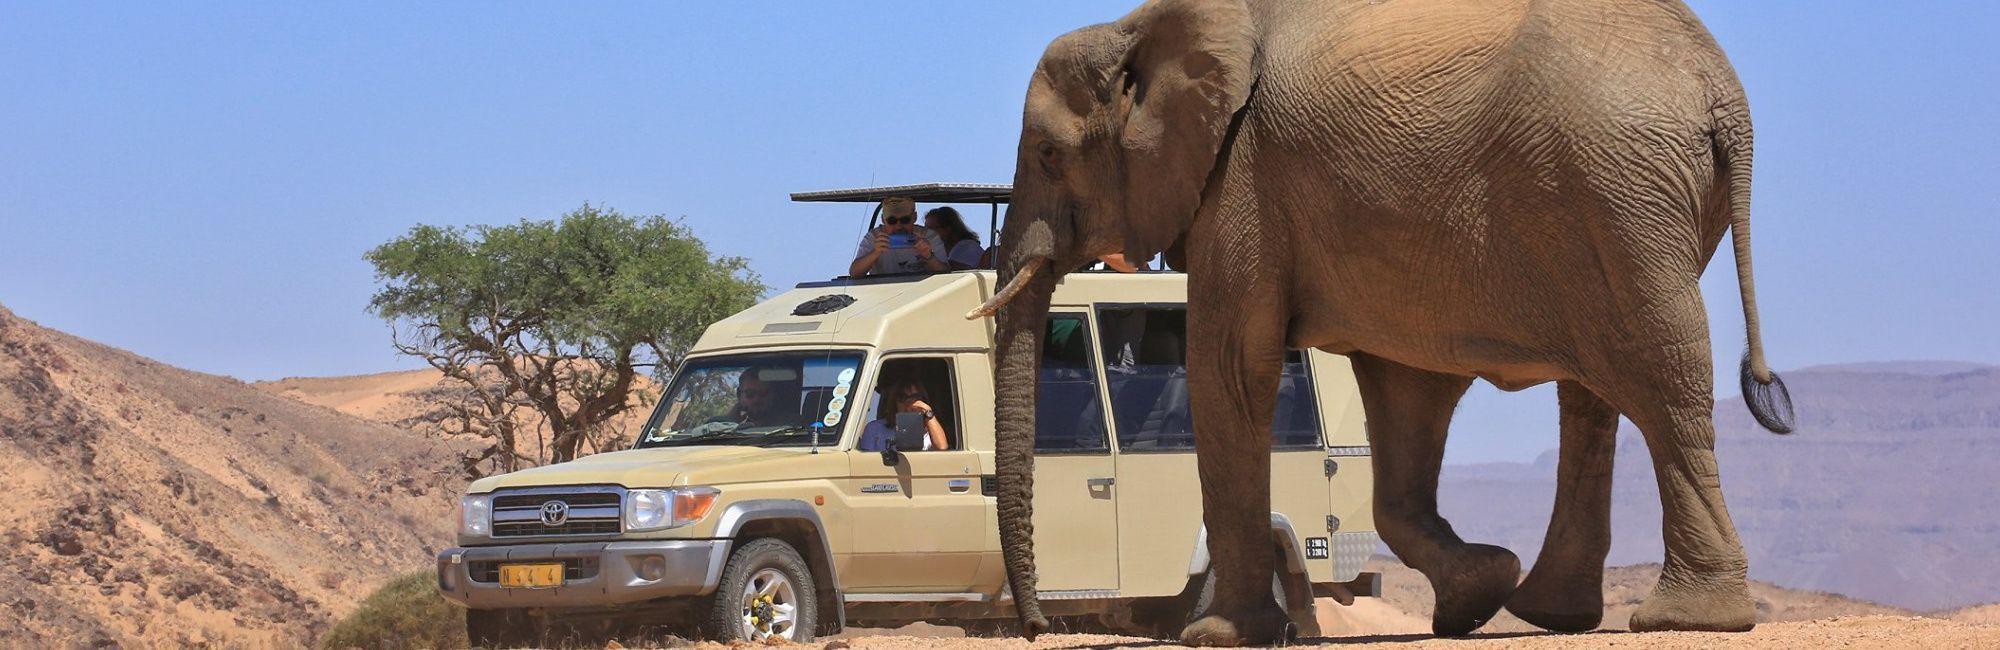 Luxe groepsreis Namibié